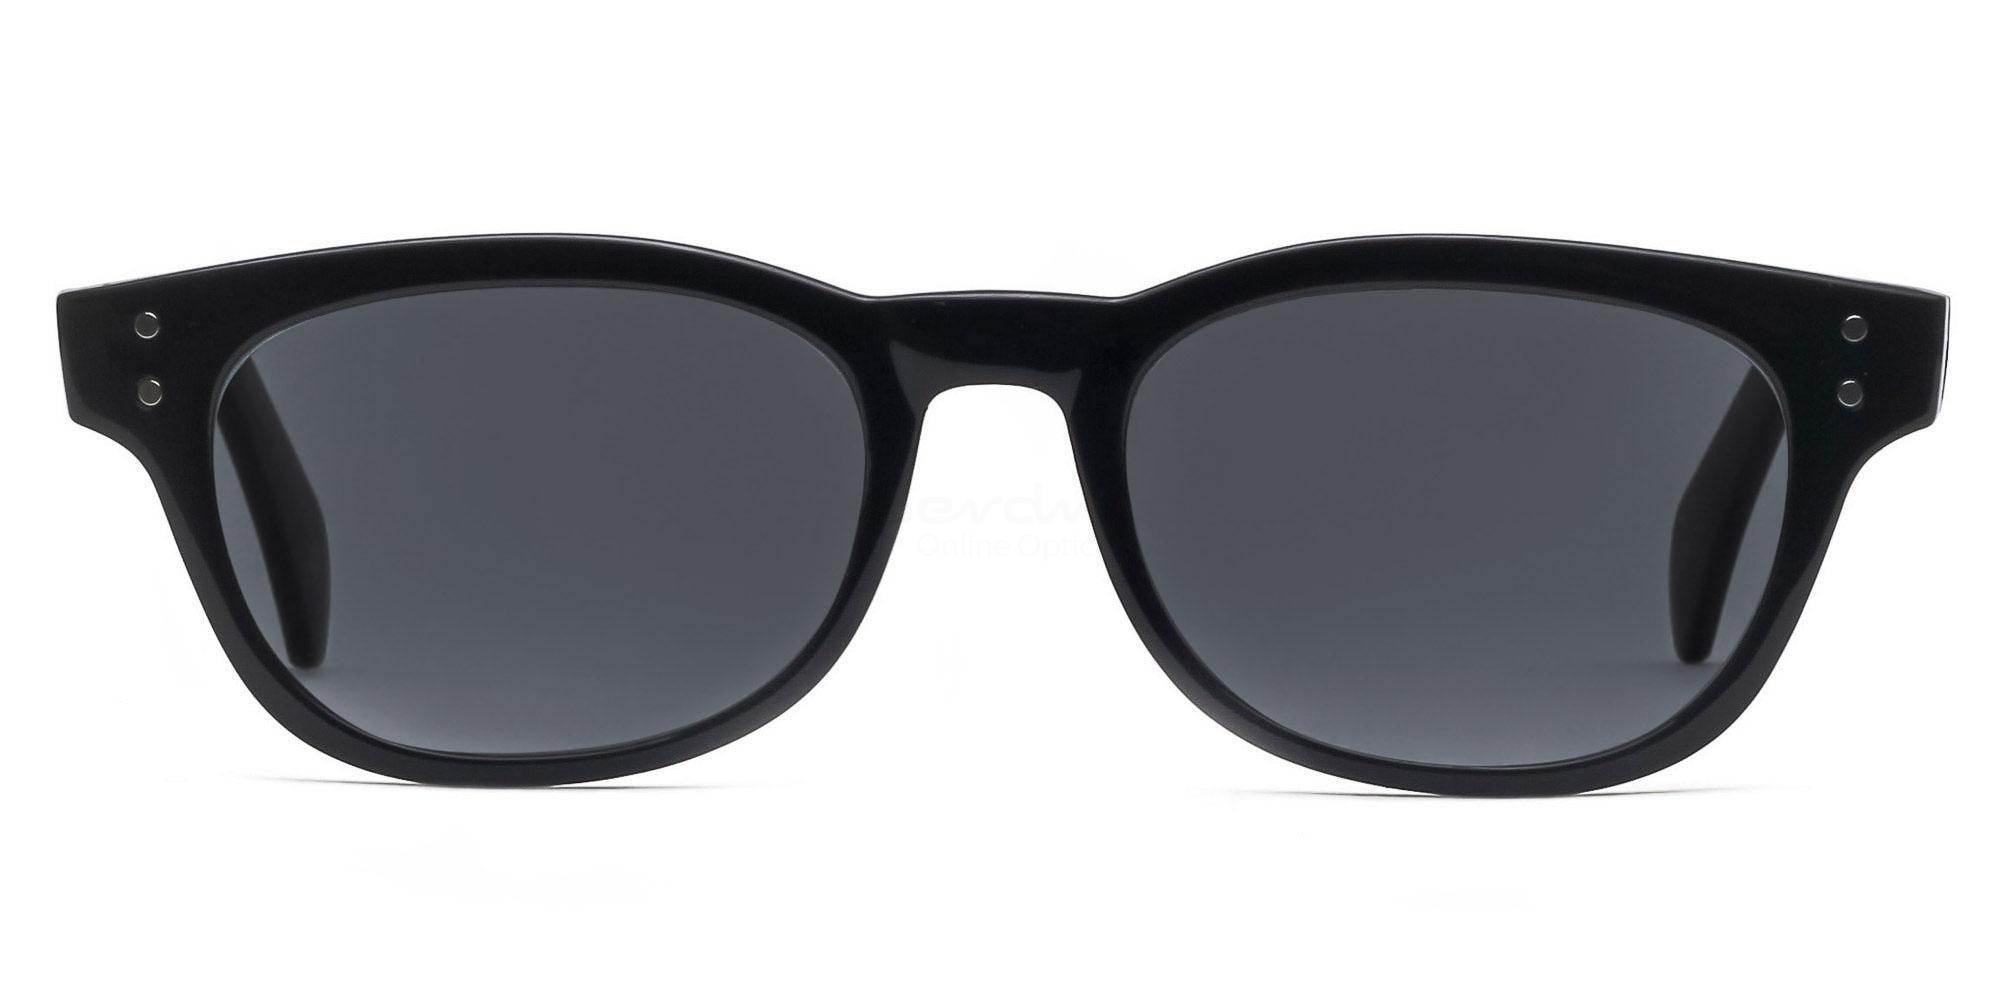 C01 Dark Grey P2249 Shiny Black (Sunglasses) Sunglasses, Indium